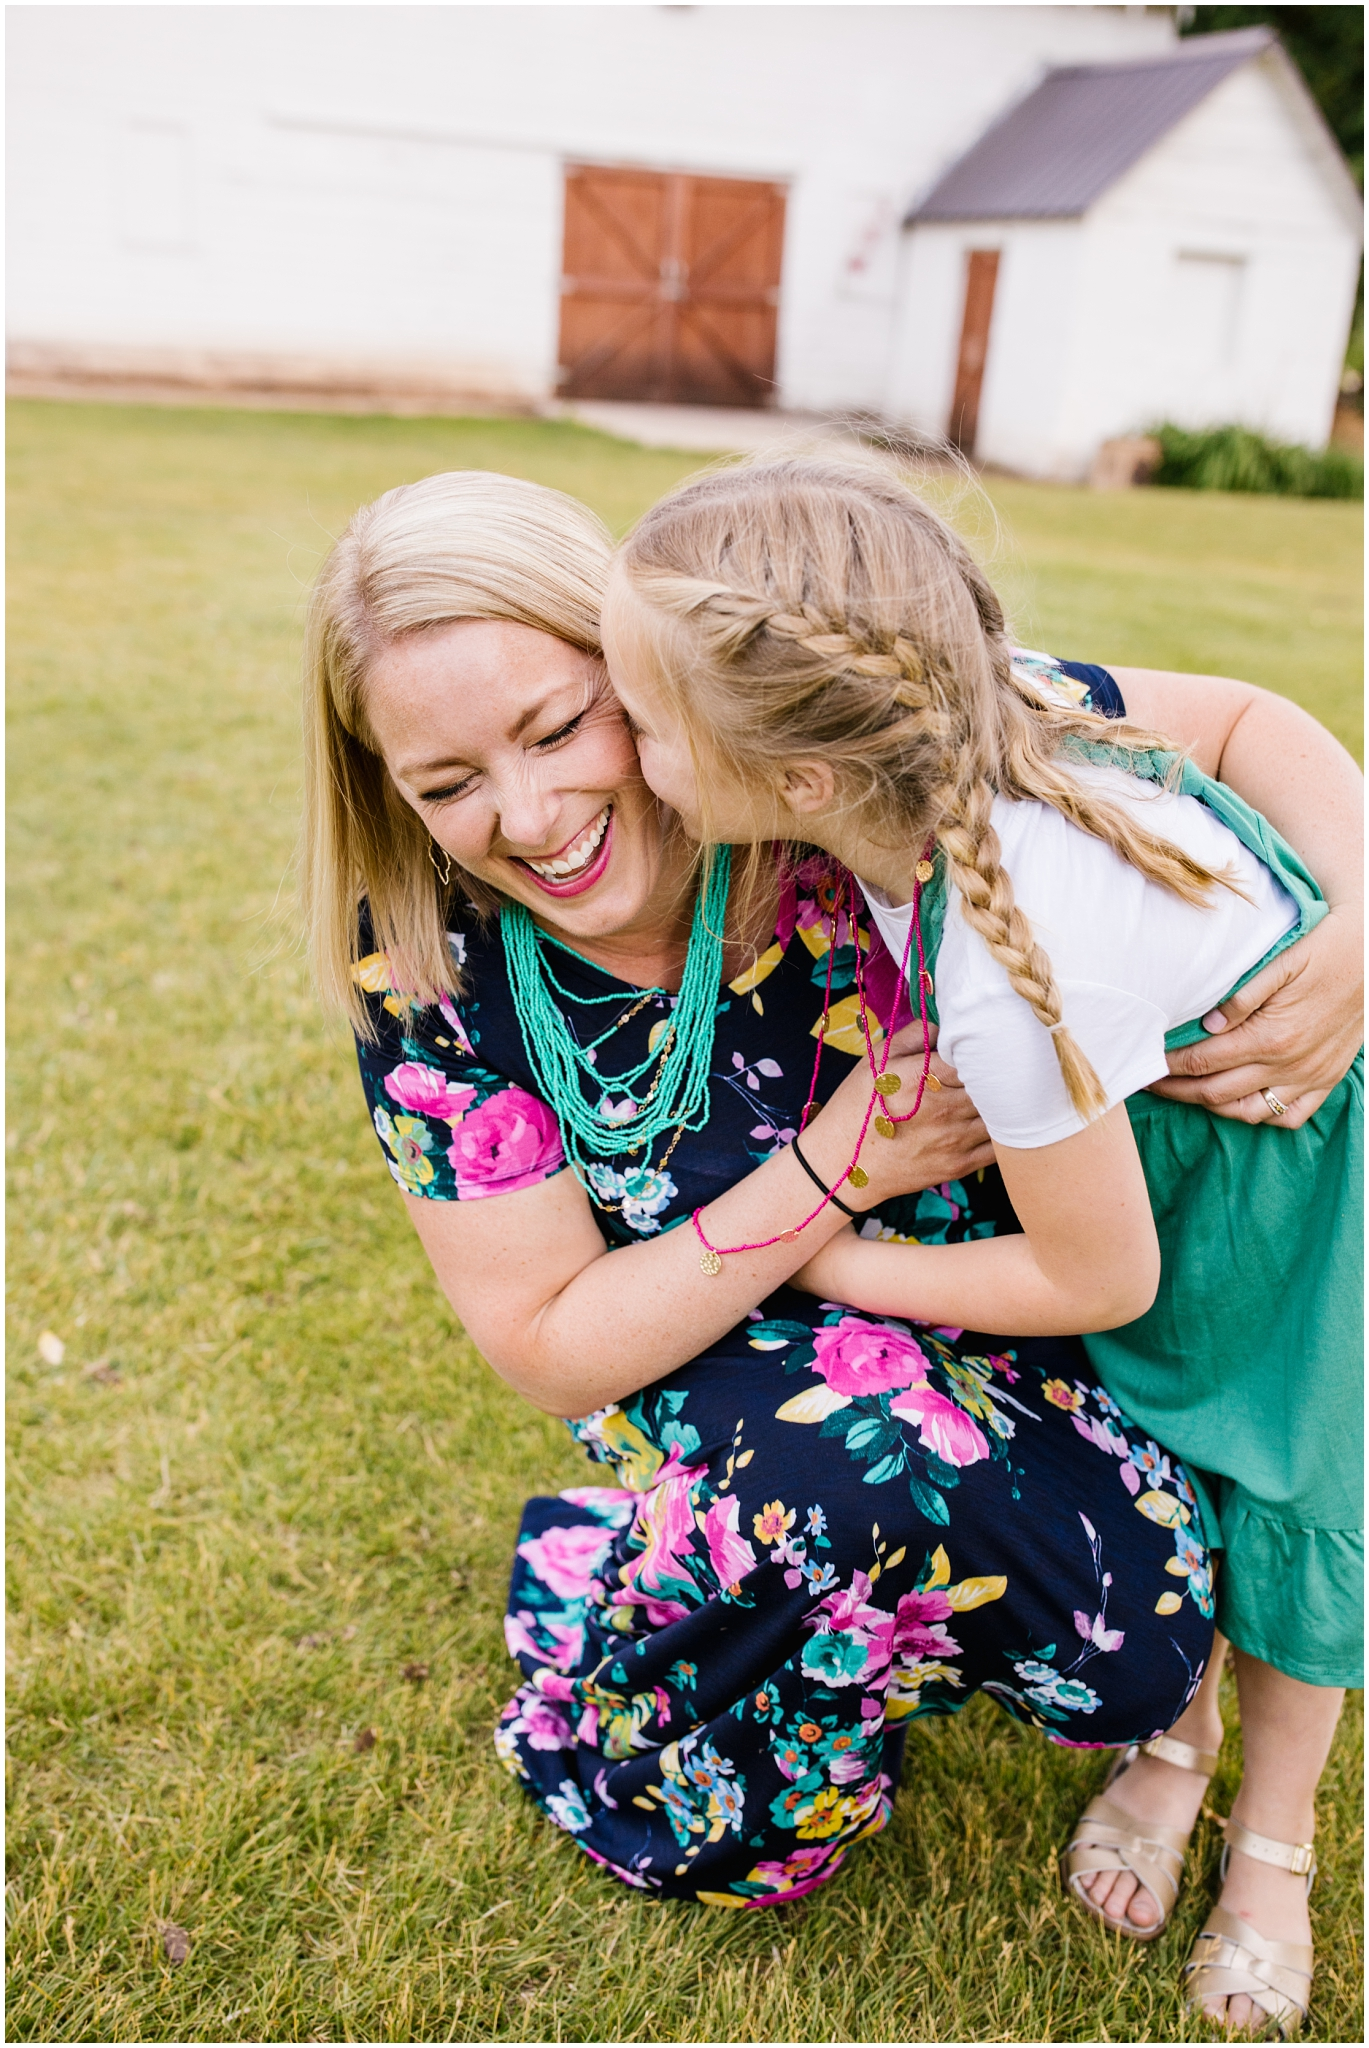 Henderson-65_Lizzie-B-Imagery-Utah-Family-Photographer-Park-City-Salt-Lake-City-Springville-Hobble-Creek-Canyon-Jolleys-Ranch.jpg